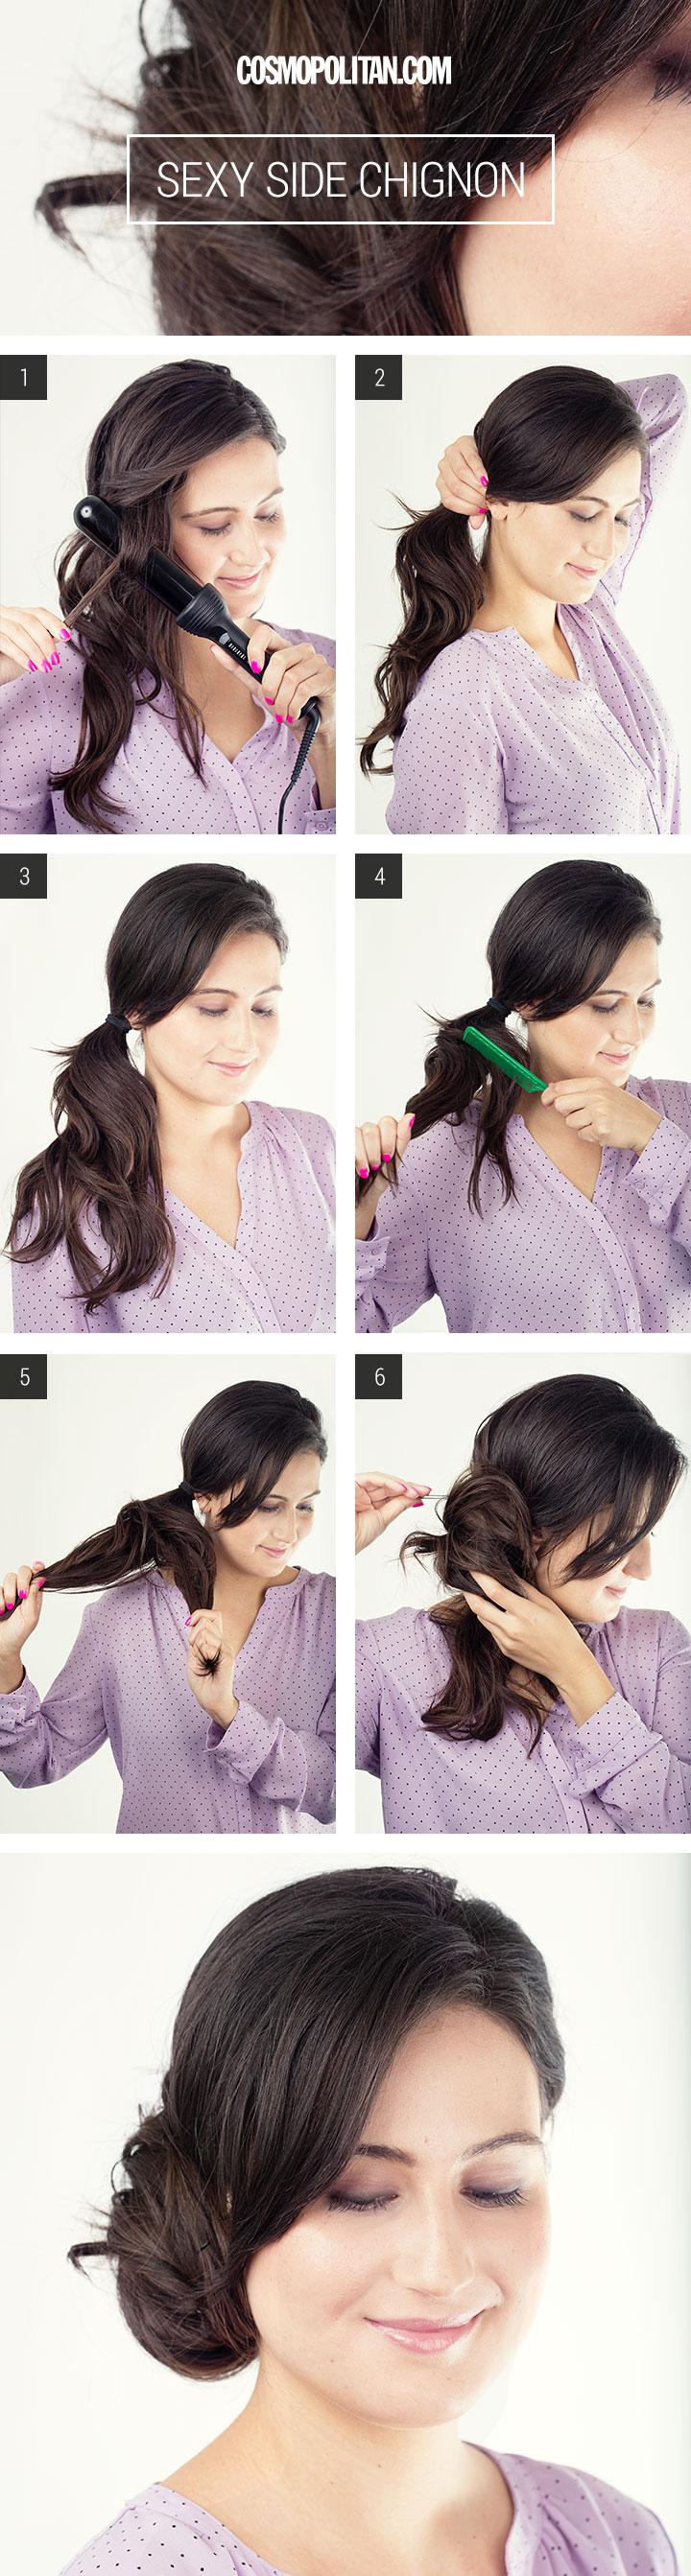 Tremendous Hair Tutorials 15 Simple Easy Hairstyles You Should Not Miss Short Hairstyles Gunalazisus